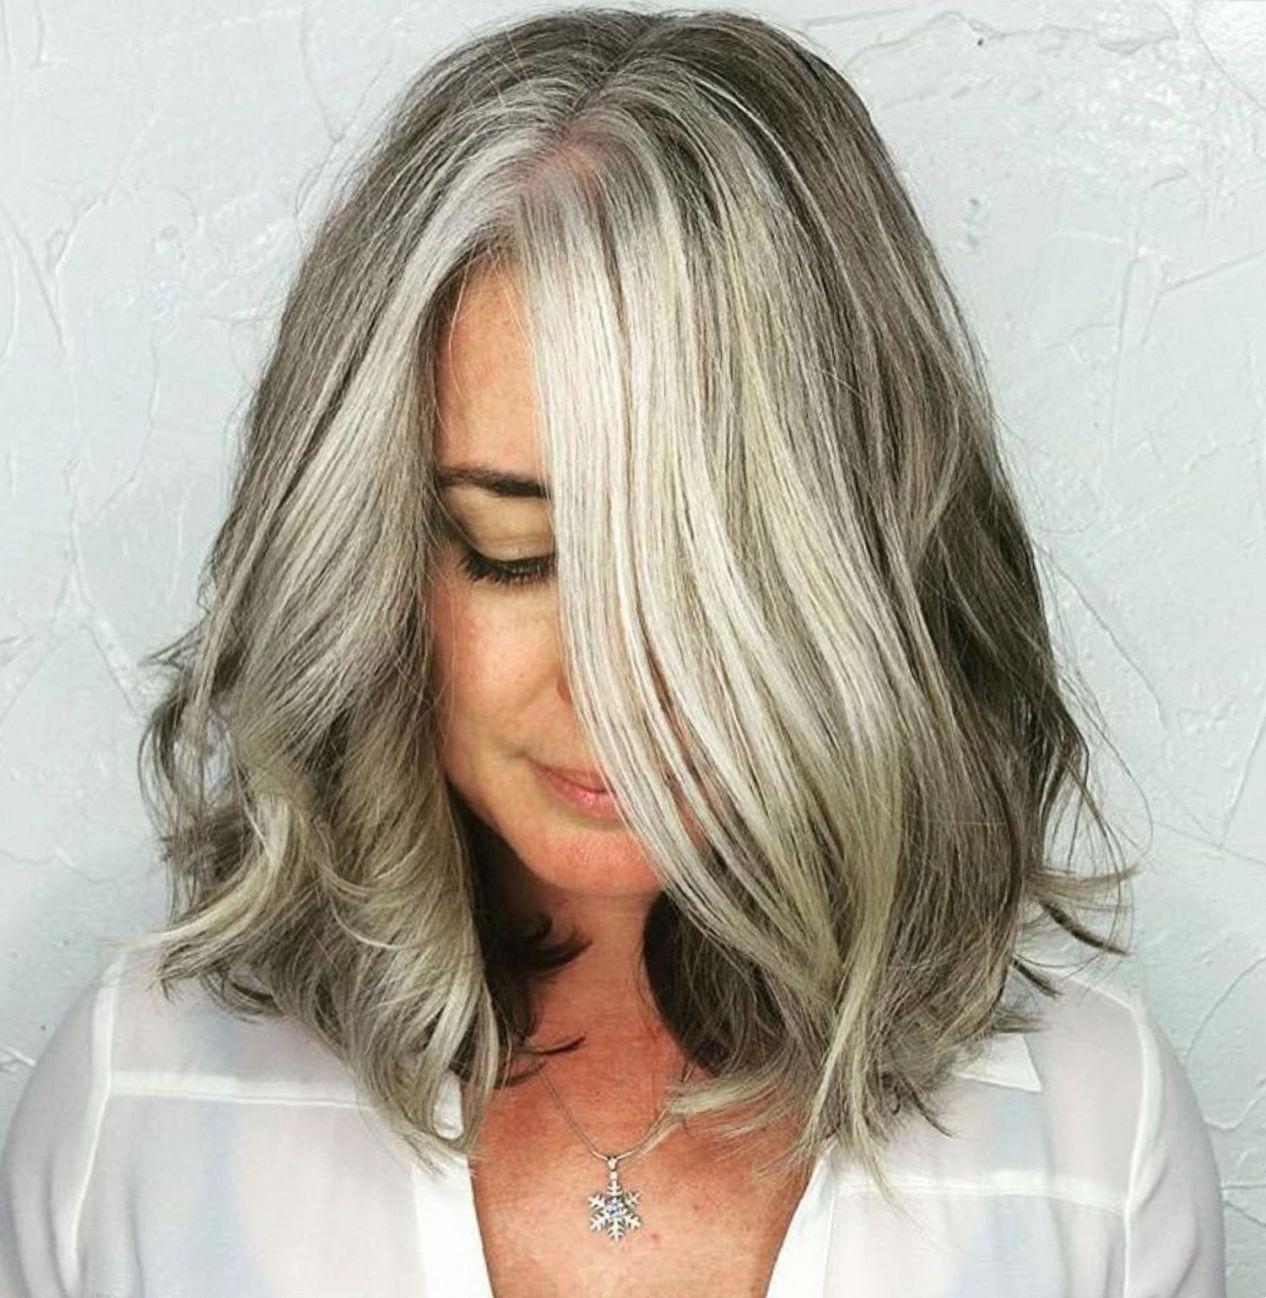 Shoulder Length Gray Wavy Bob Shoulderlengthhaircuts Thick Hair Styles Gray Balayage Gorgeous Gray Hair